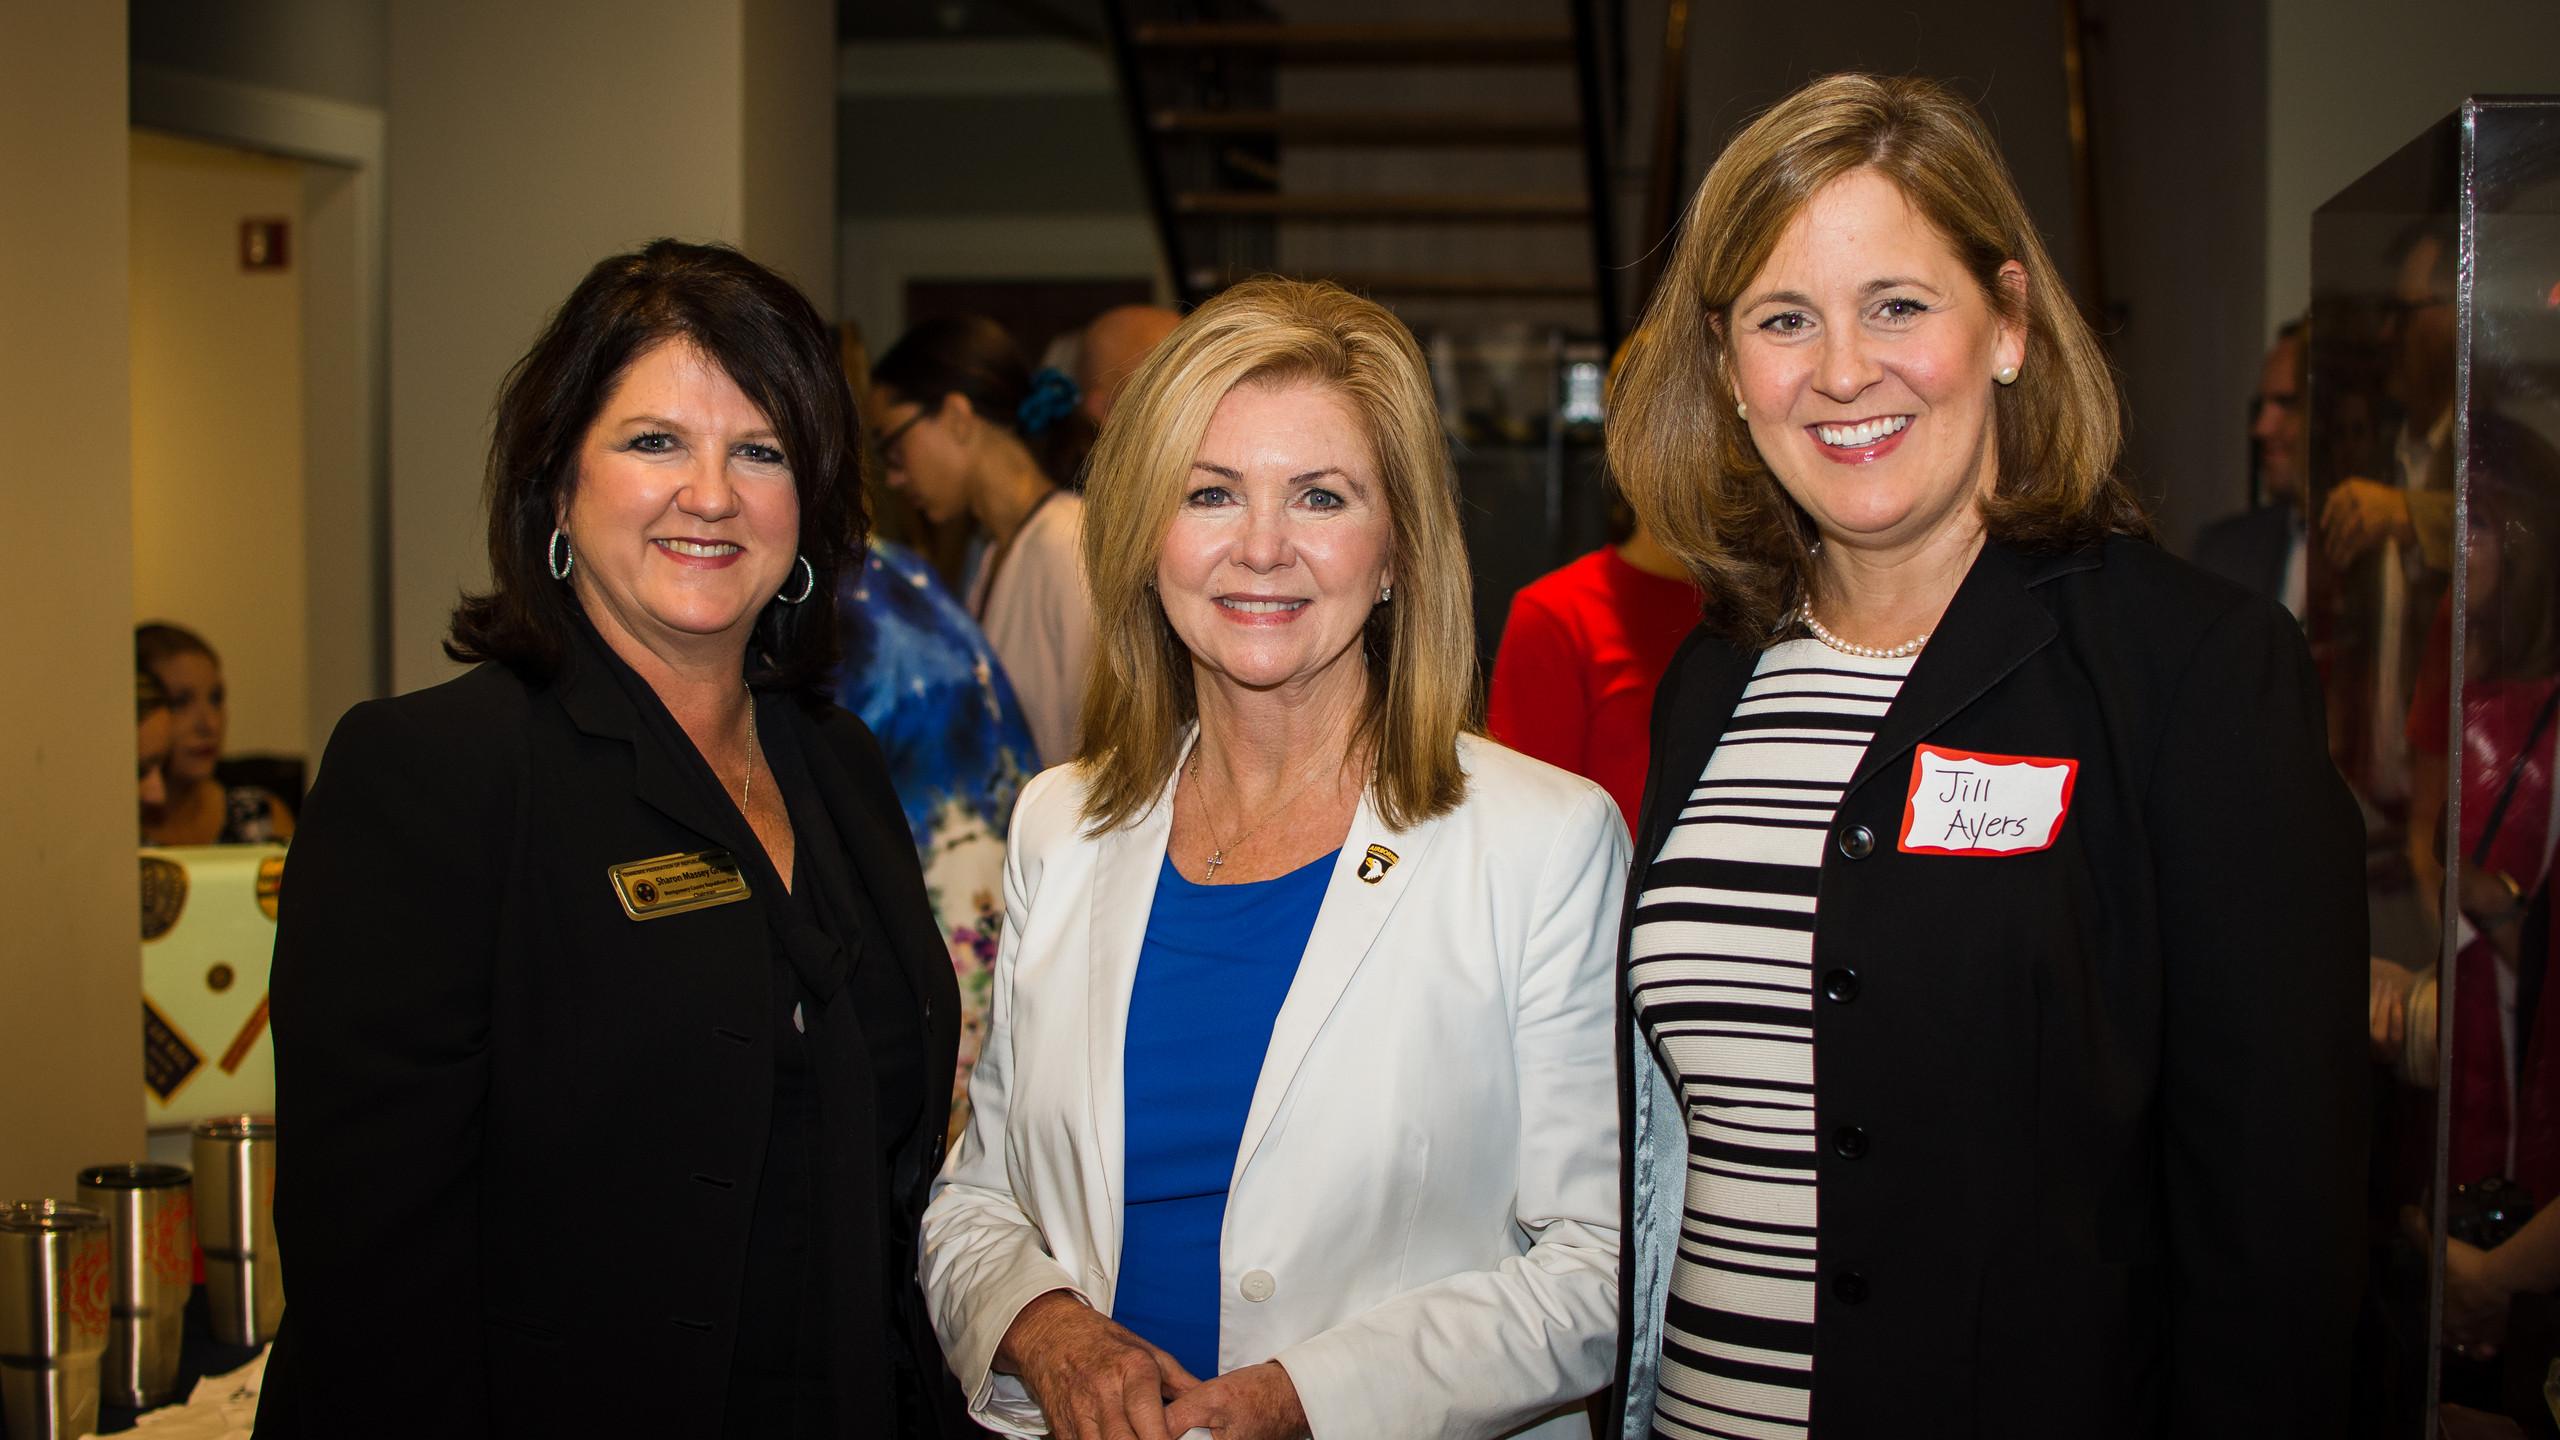 Sharon Grimes, Marsha Blackburn, and Jil